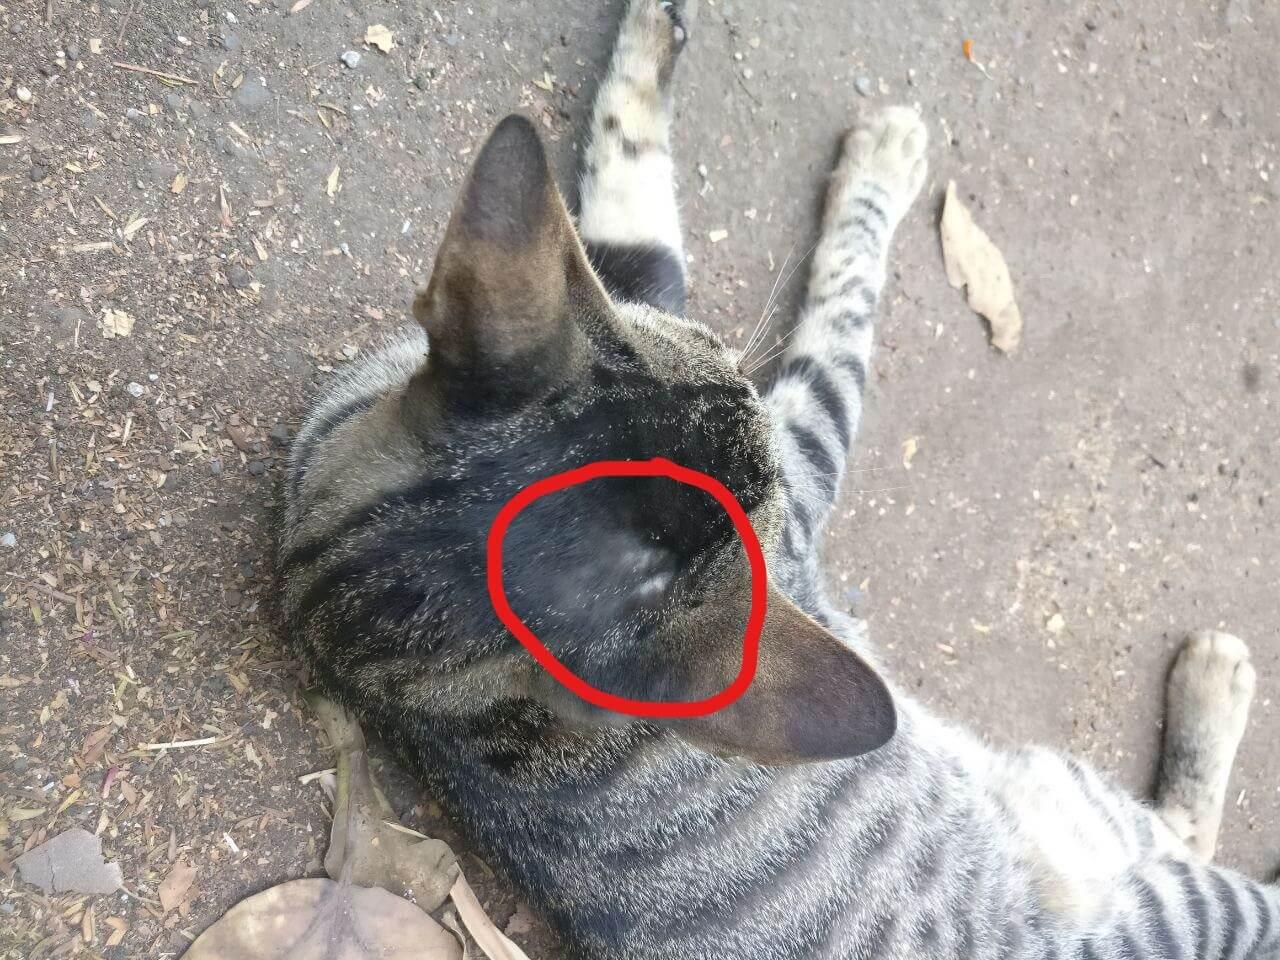 ciri scabies pada kucing adalah bulu kepala kucing rontok